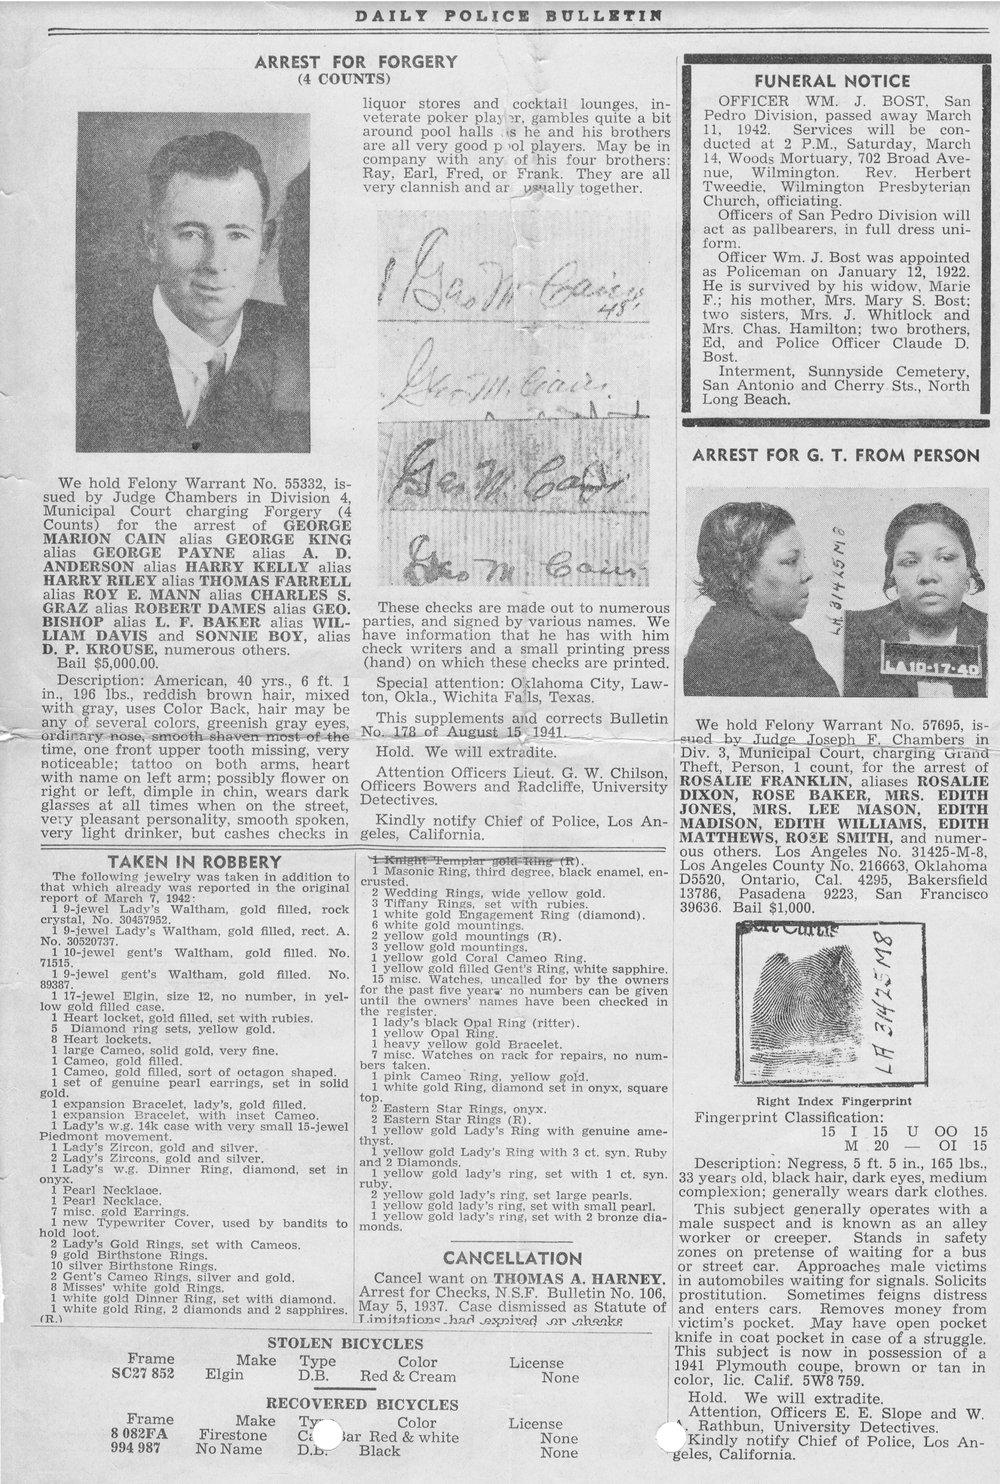 p2 Police Bulletin March 13, 1942.jpg